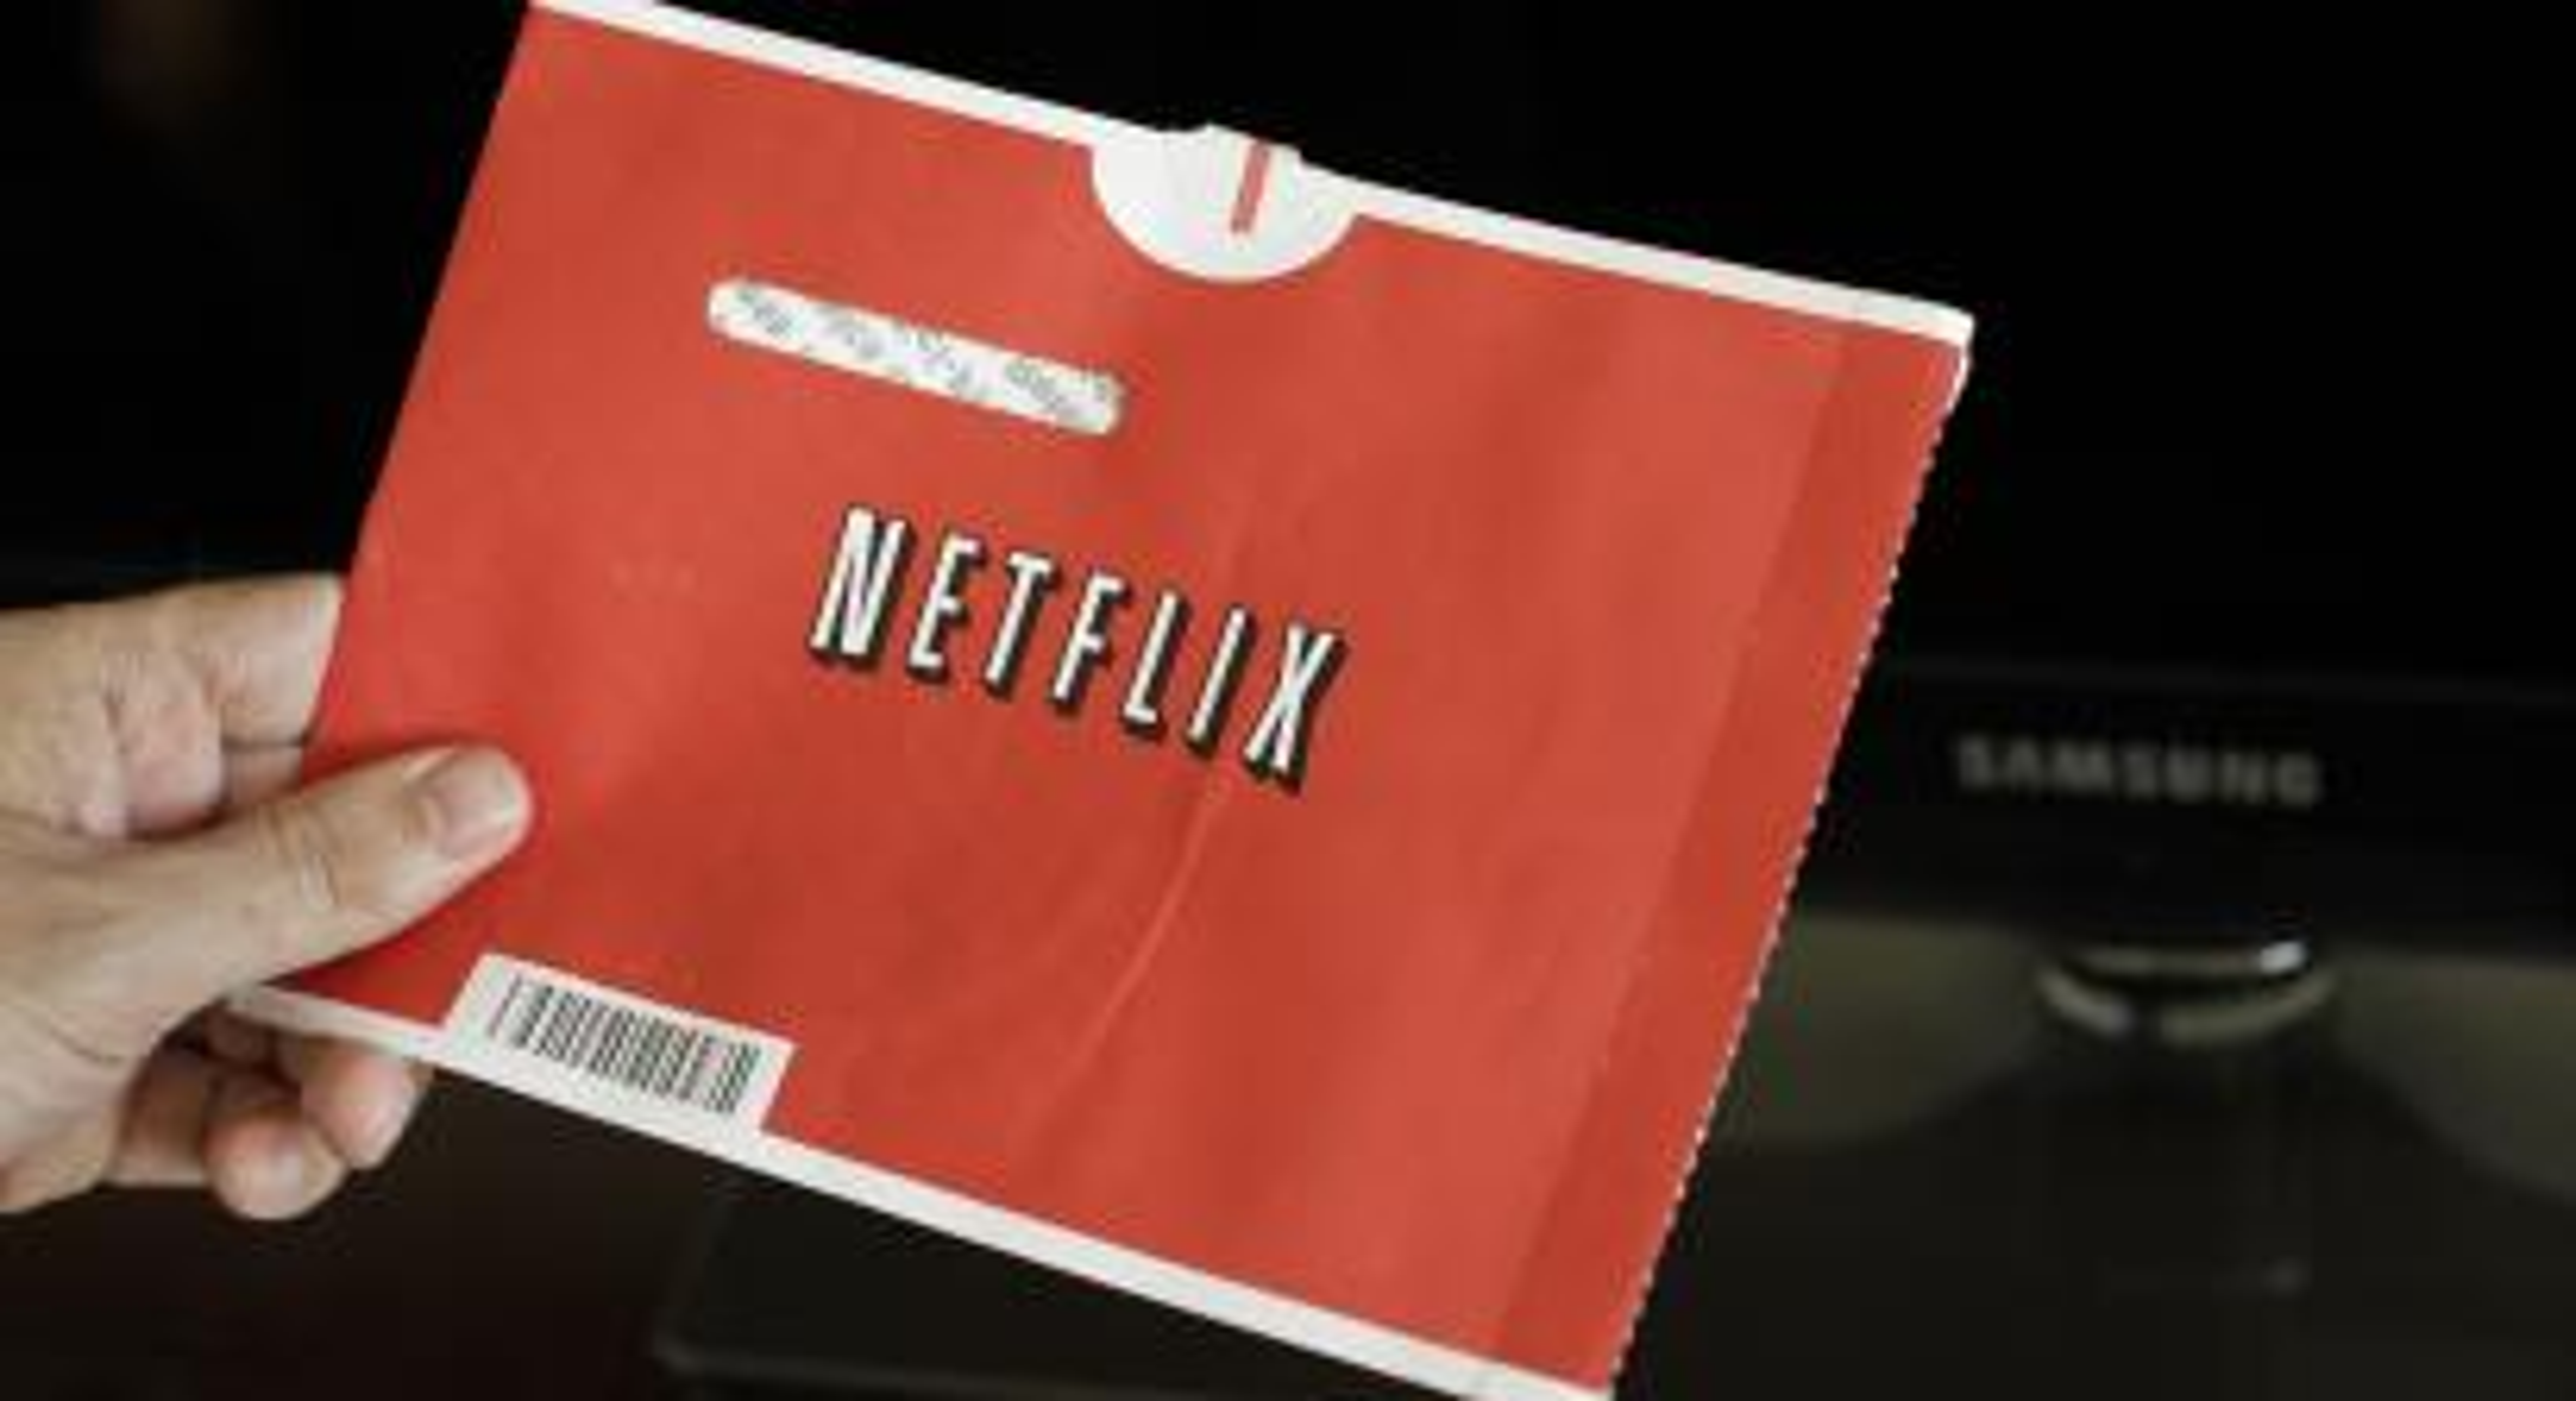 Netflix (NFLX) hasn't forgotten about its 4 3 million DVD